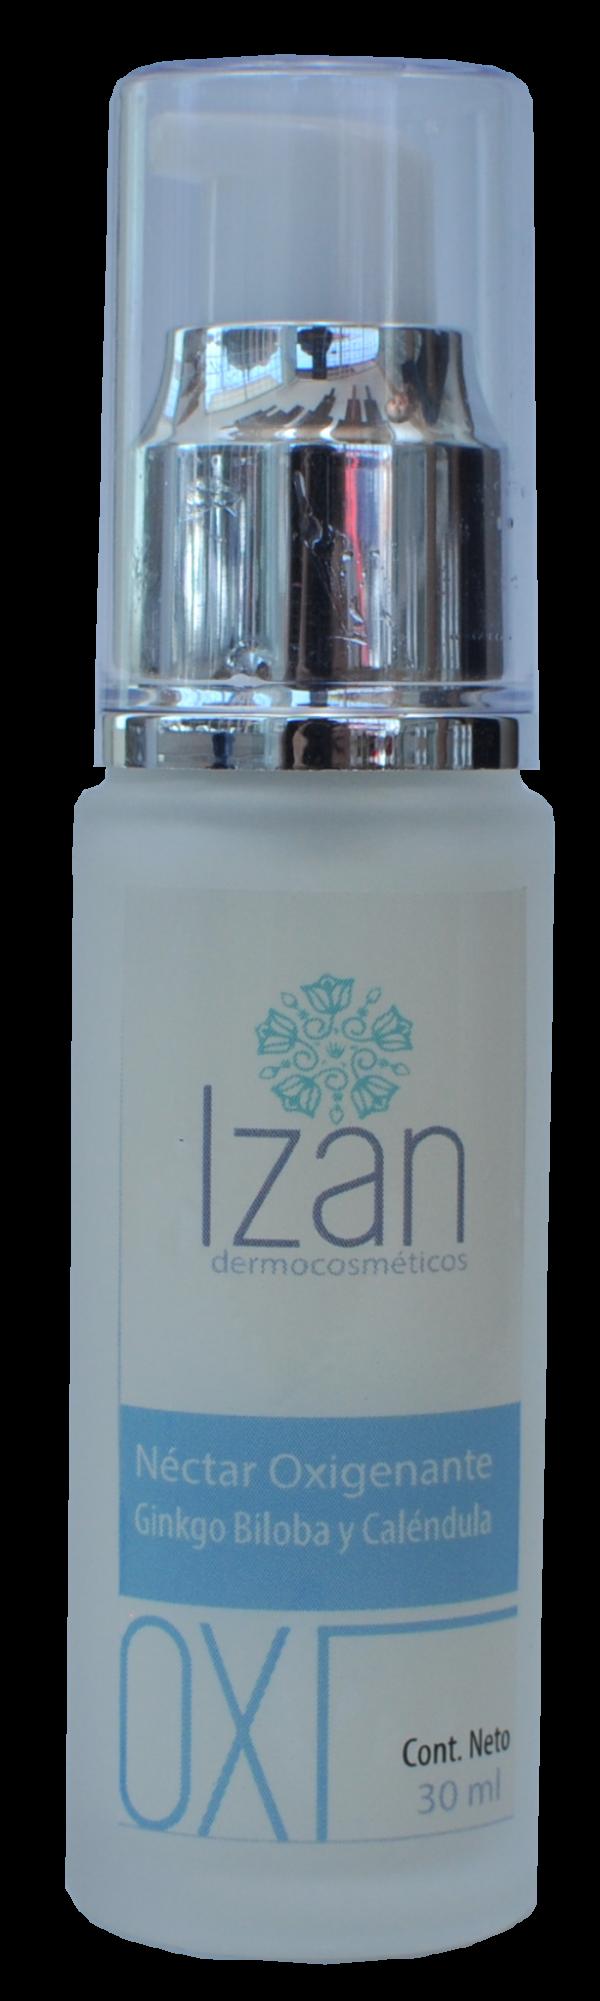 Néctar oxigenante IZAN Dermocosméticos